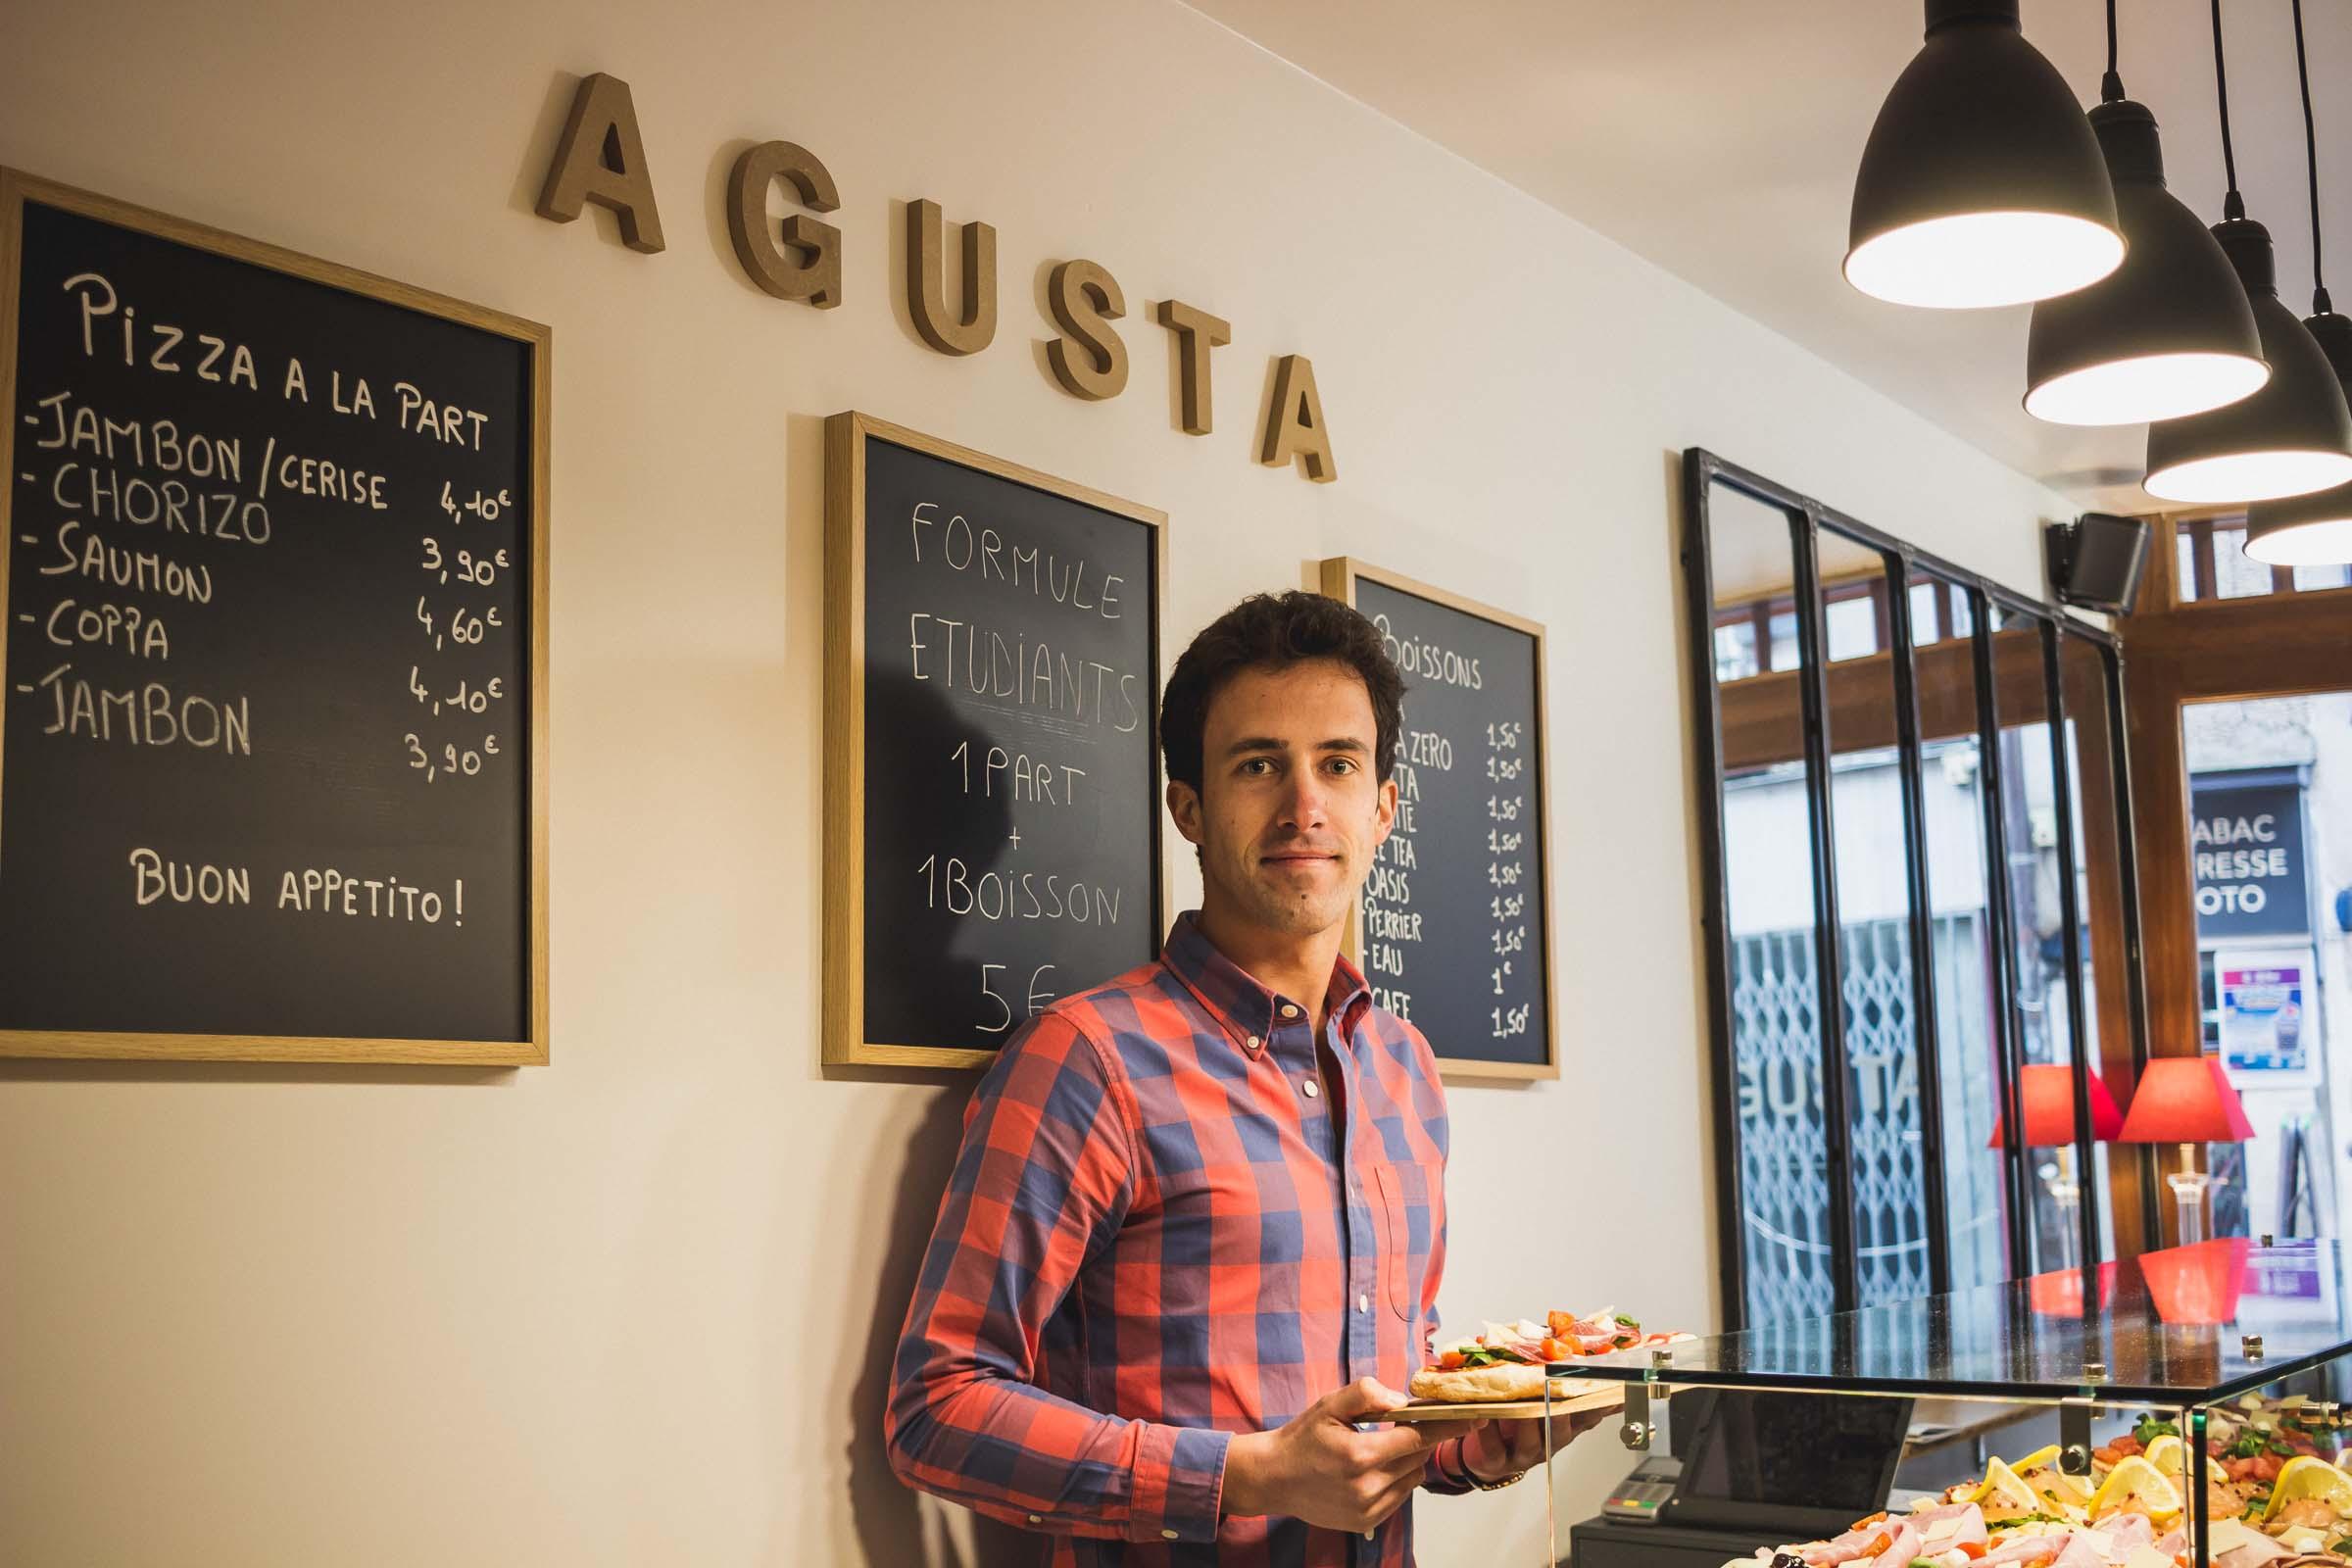 agusta pizzeria pizza part bayonne pays basque